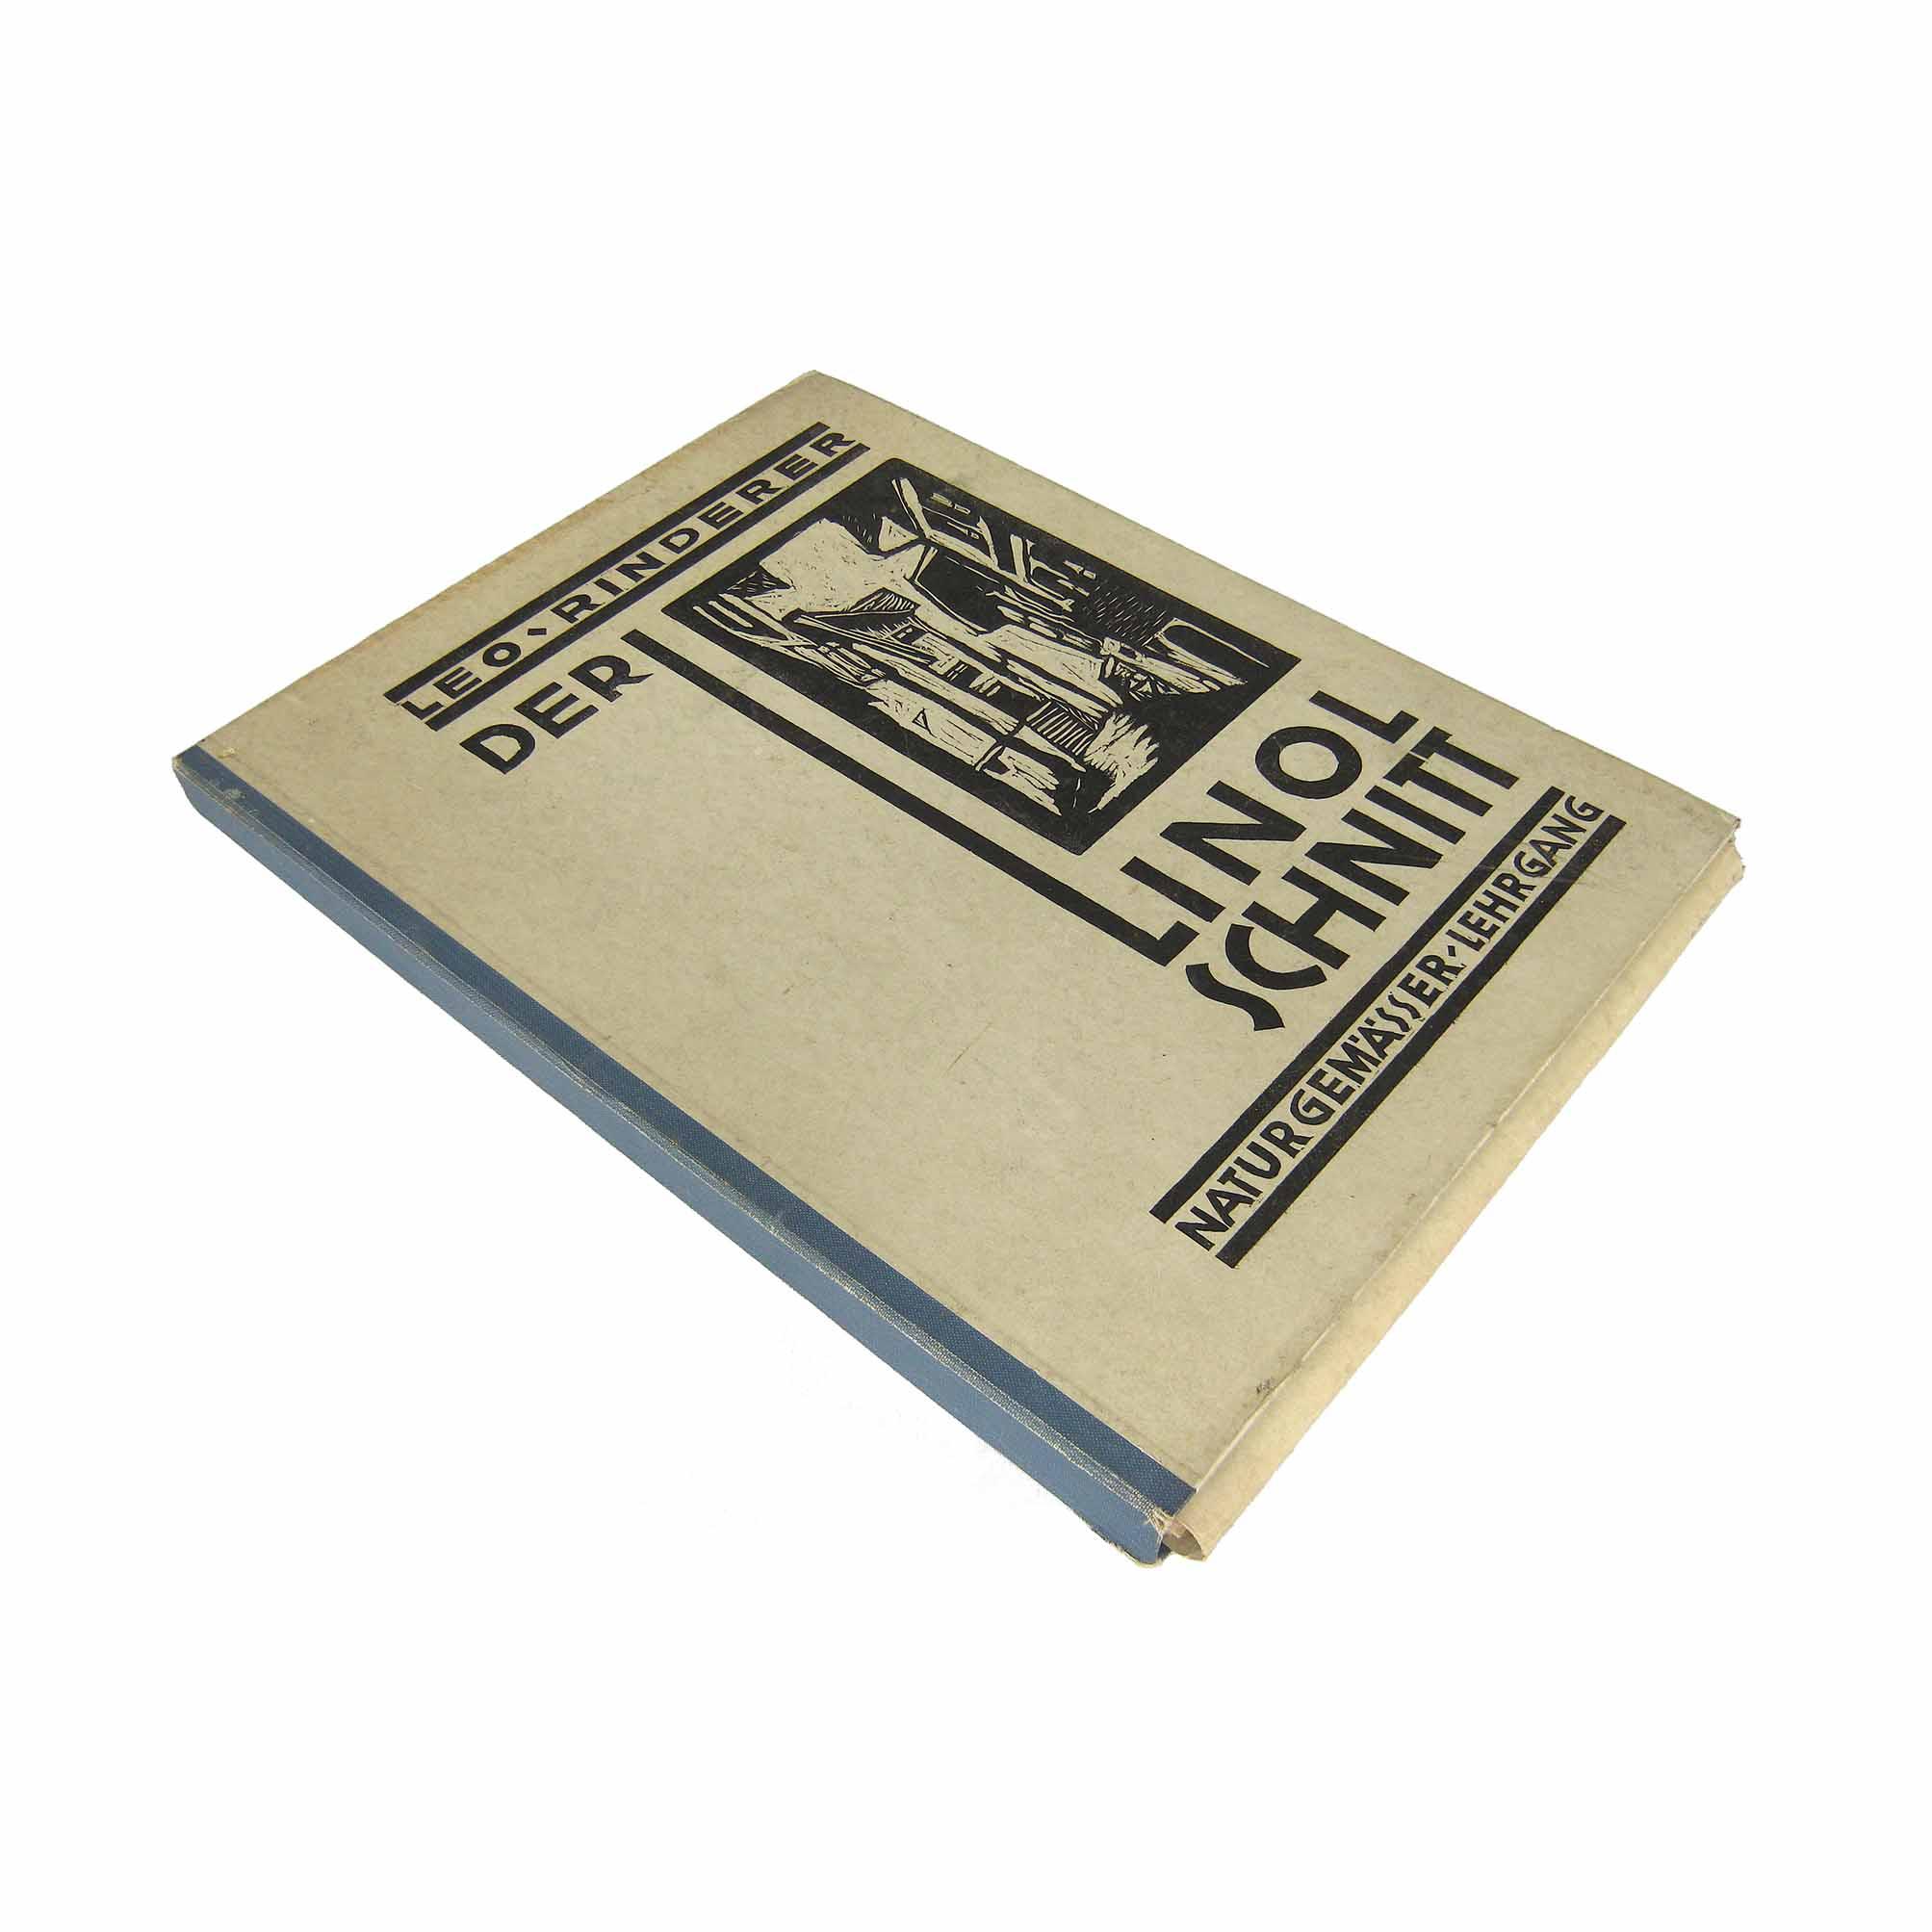 5501-Rinderer-Linolschnitt-1932-Mappe-recto-frei-N.jpg